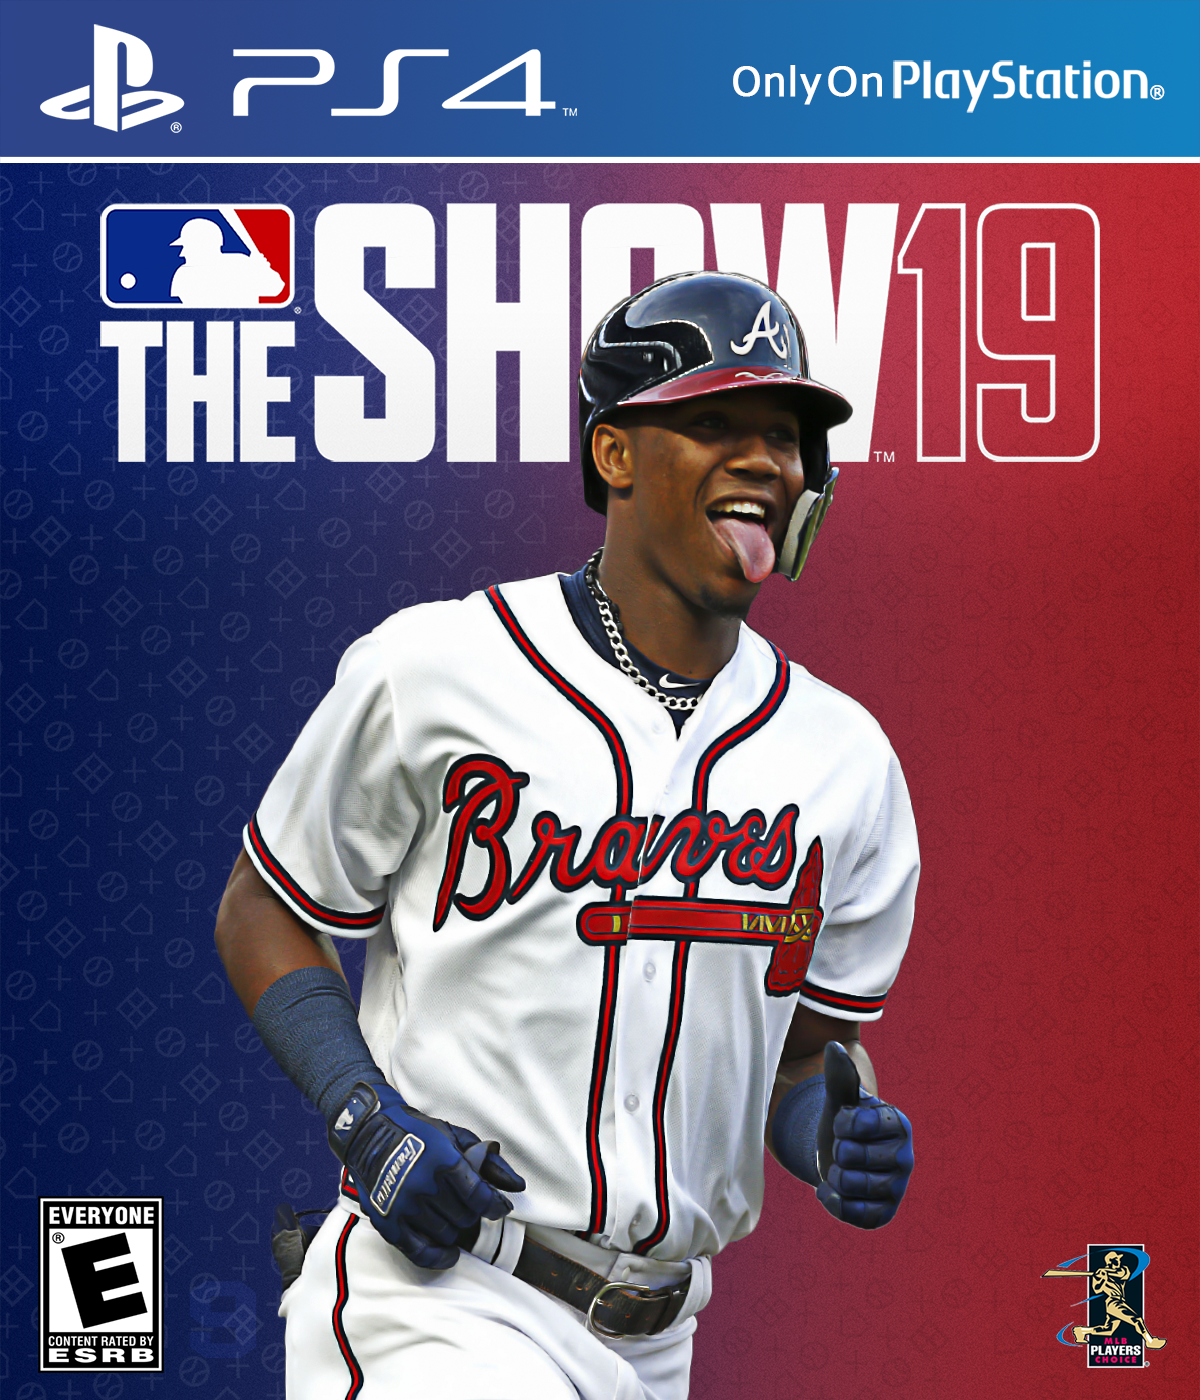 Mlb The Show 19 Covers On Behance Mlb The Show Mlb Mlb Baseball